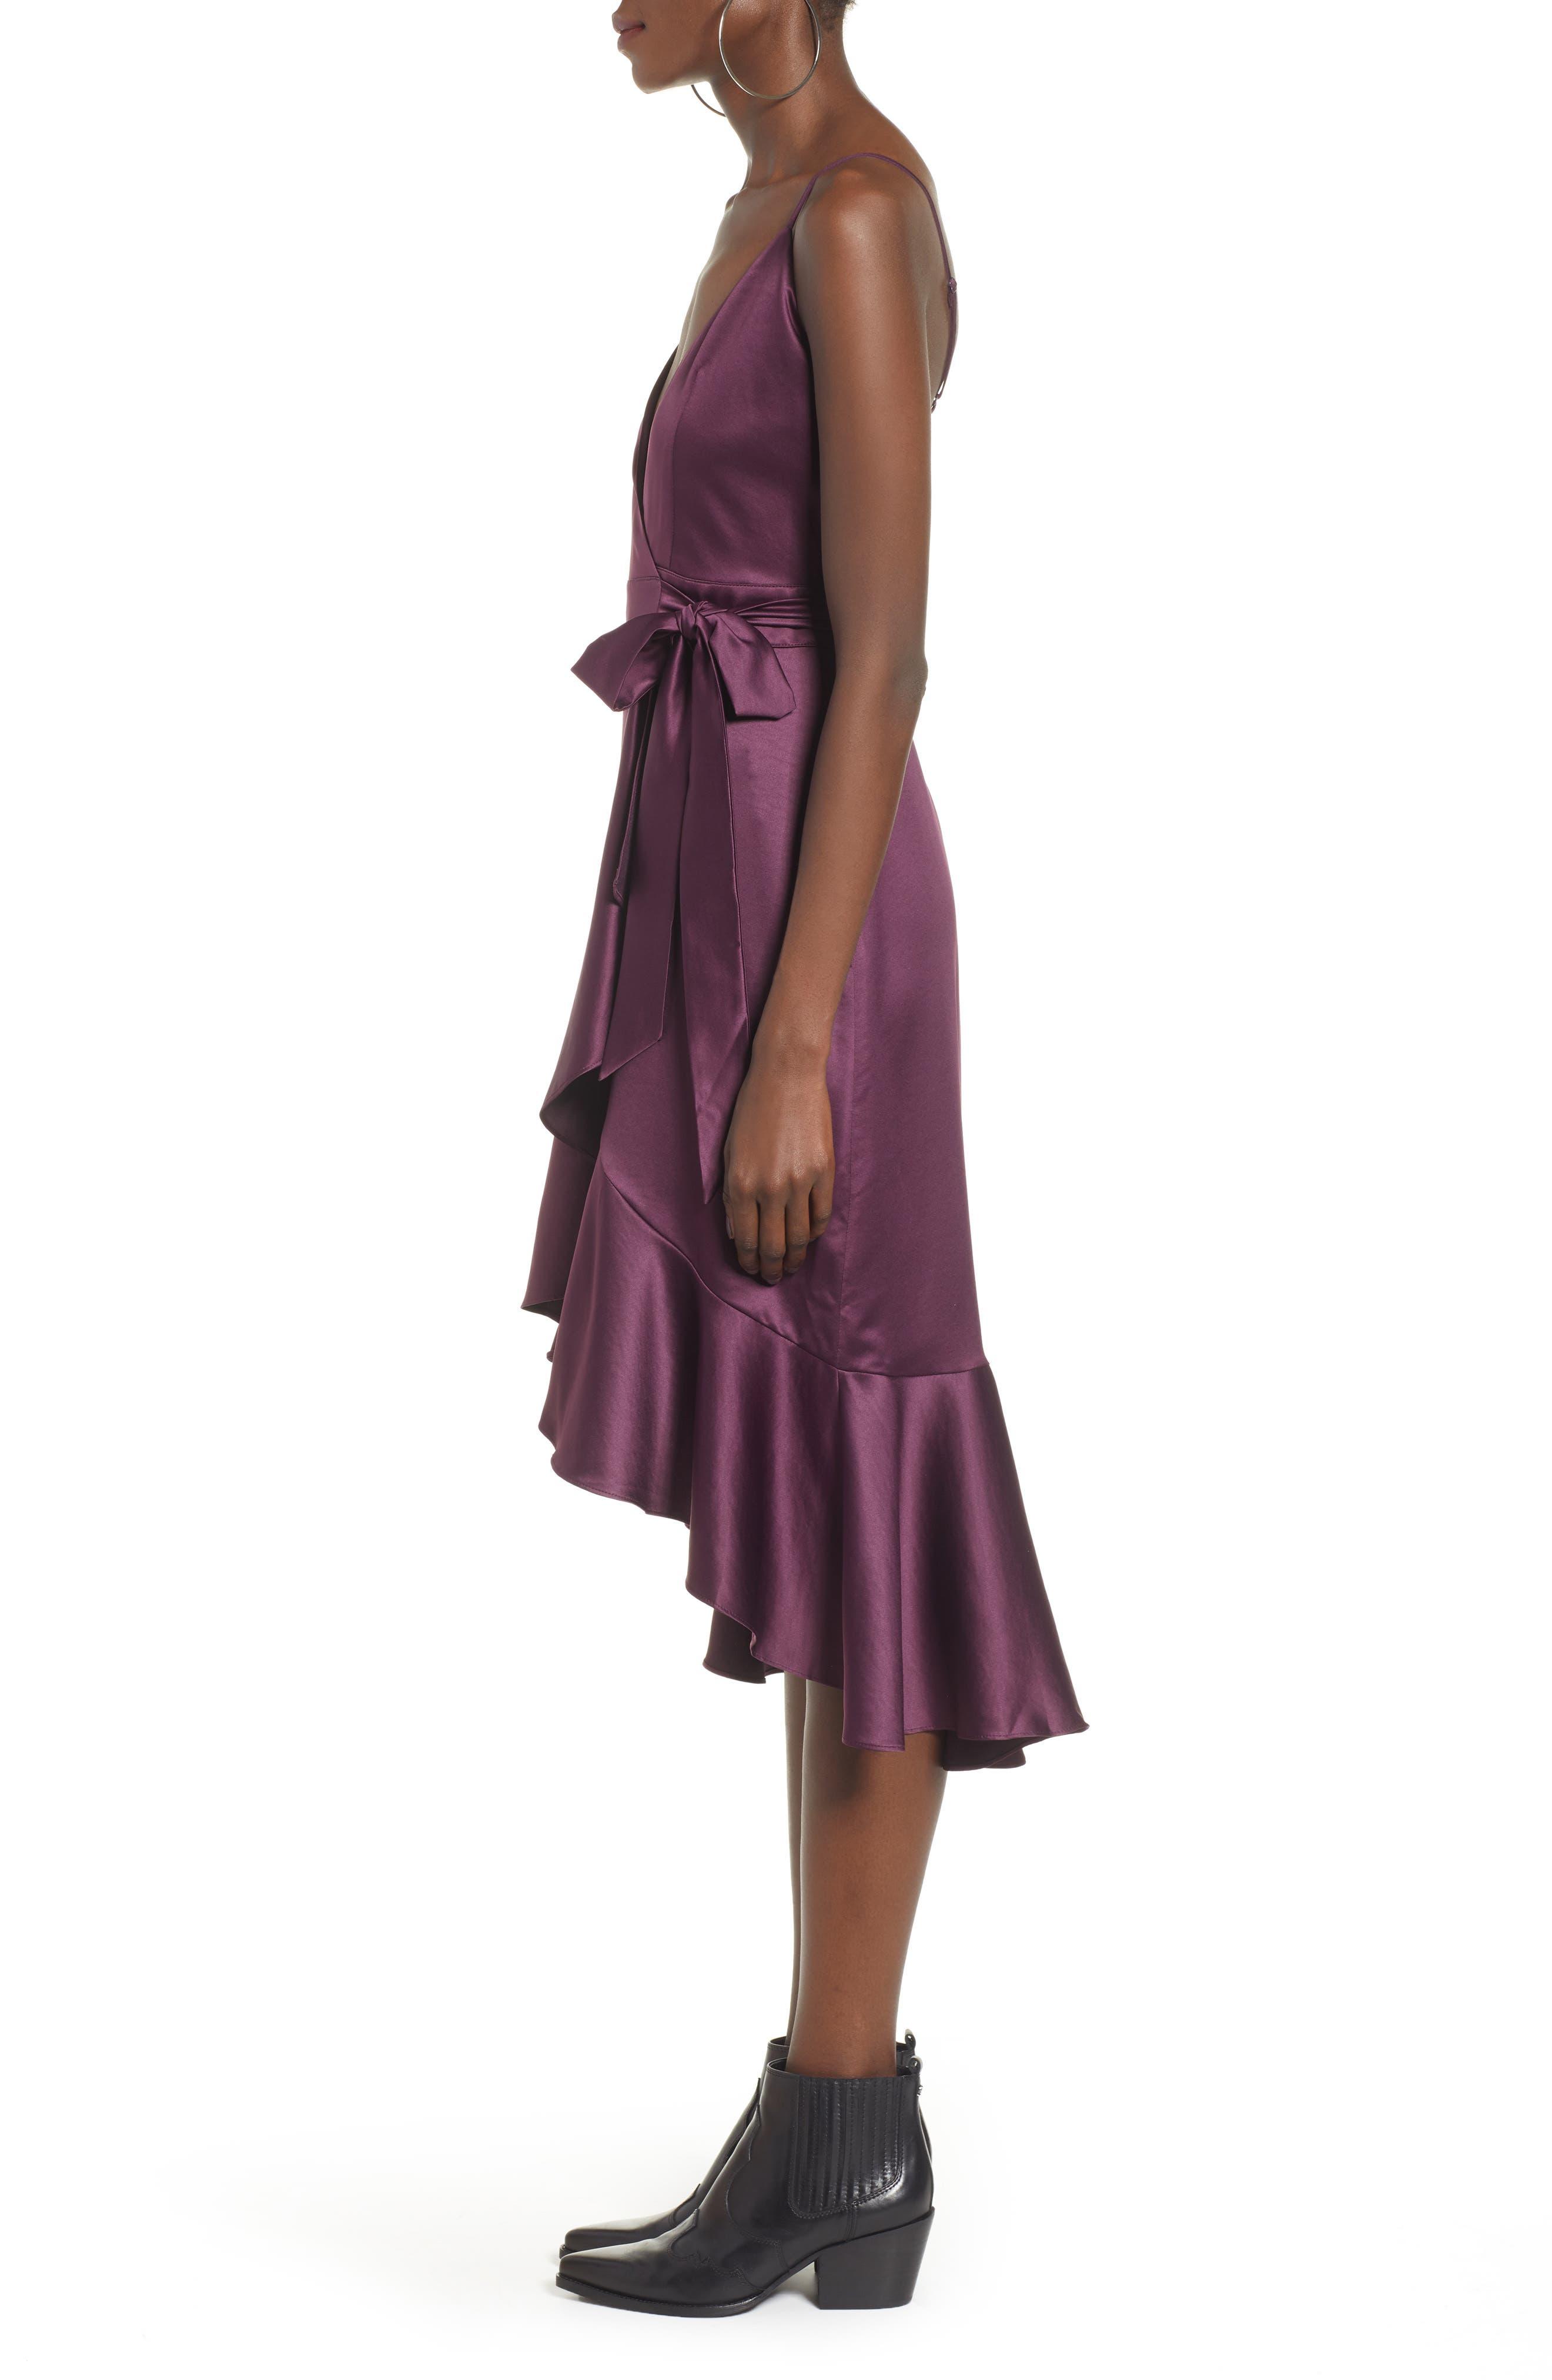 BAND OF GYPSIES,                             Payton Ruffled High/Low Dress,                             Alternate thumbnail 3, color,                             PLUM